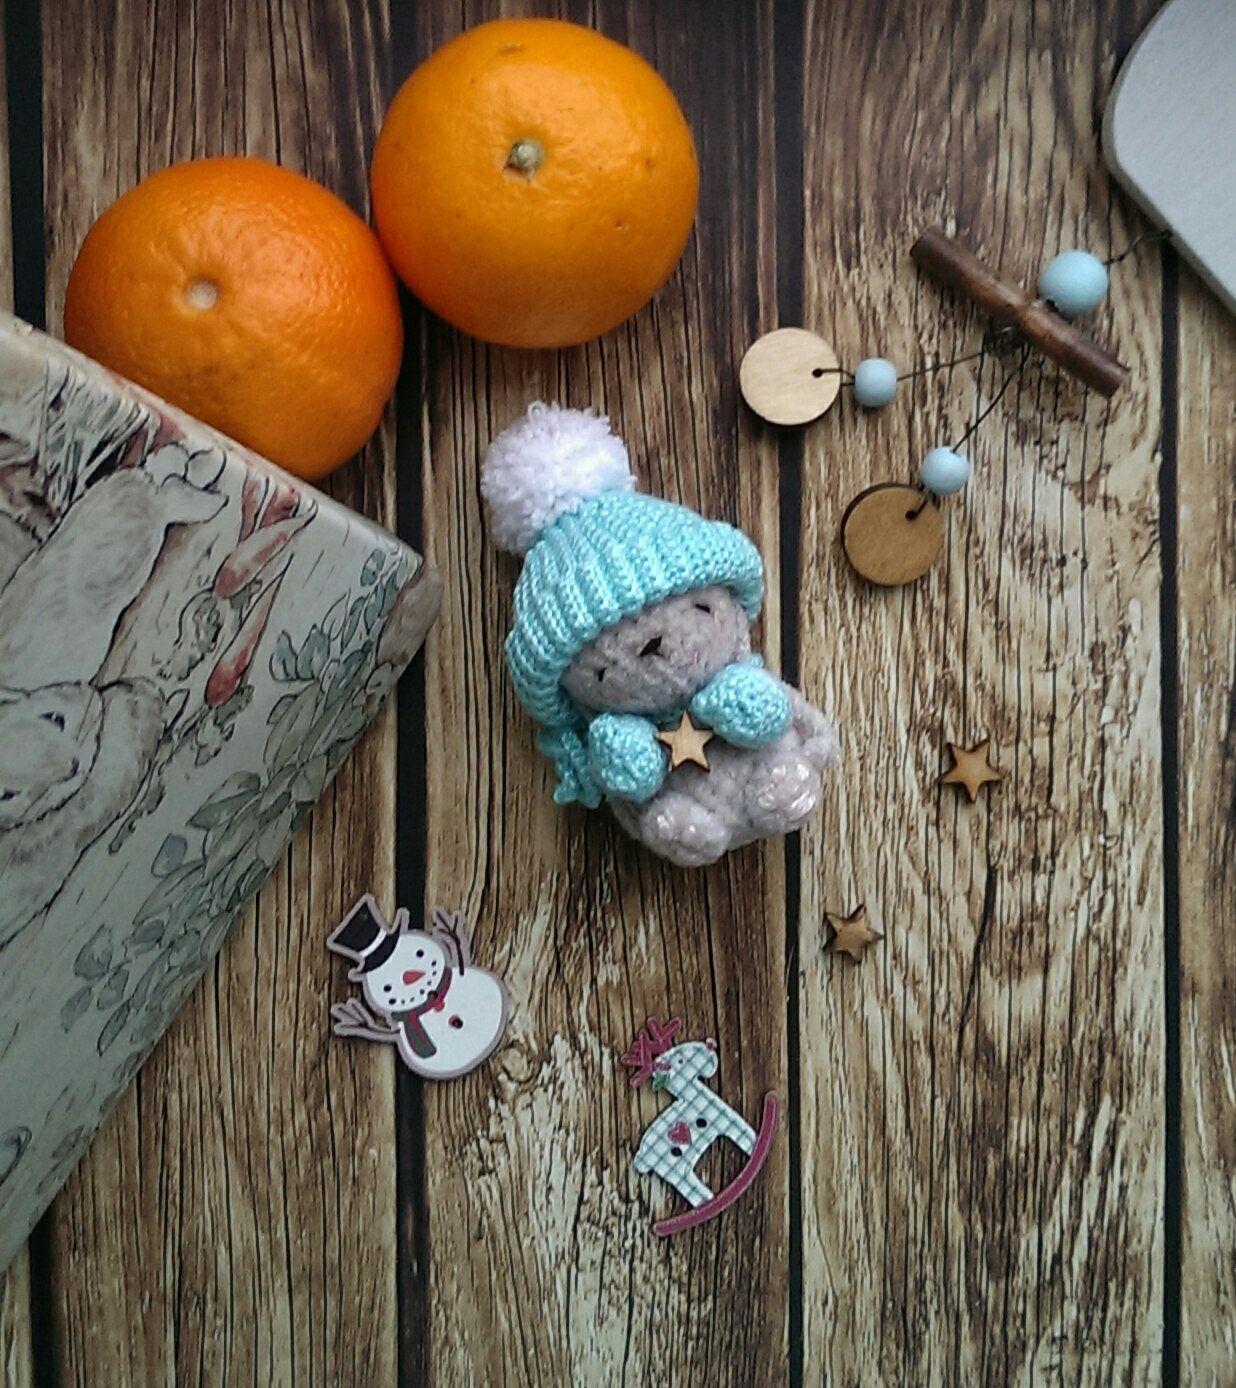 ручнаяработа подарок амигуруми интерьернаяигрушка вязаннаяигрушка зайка